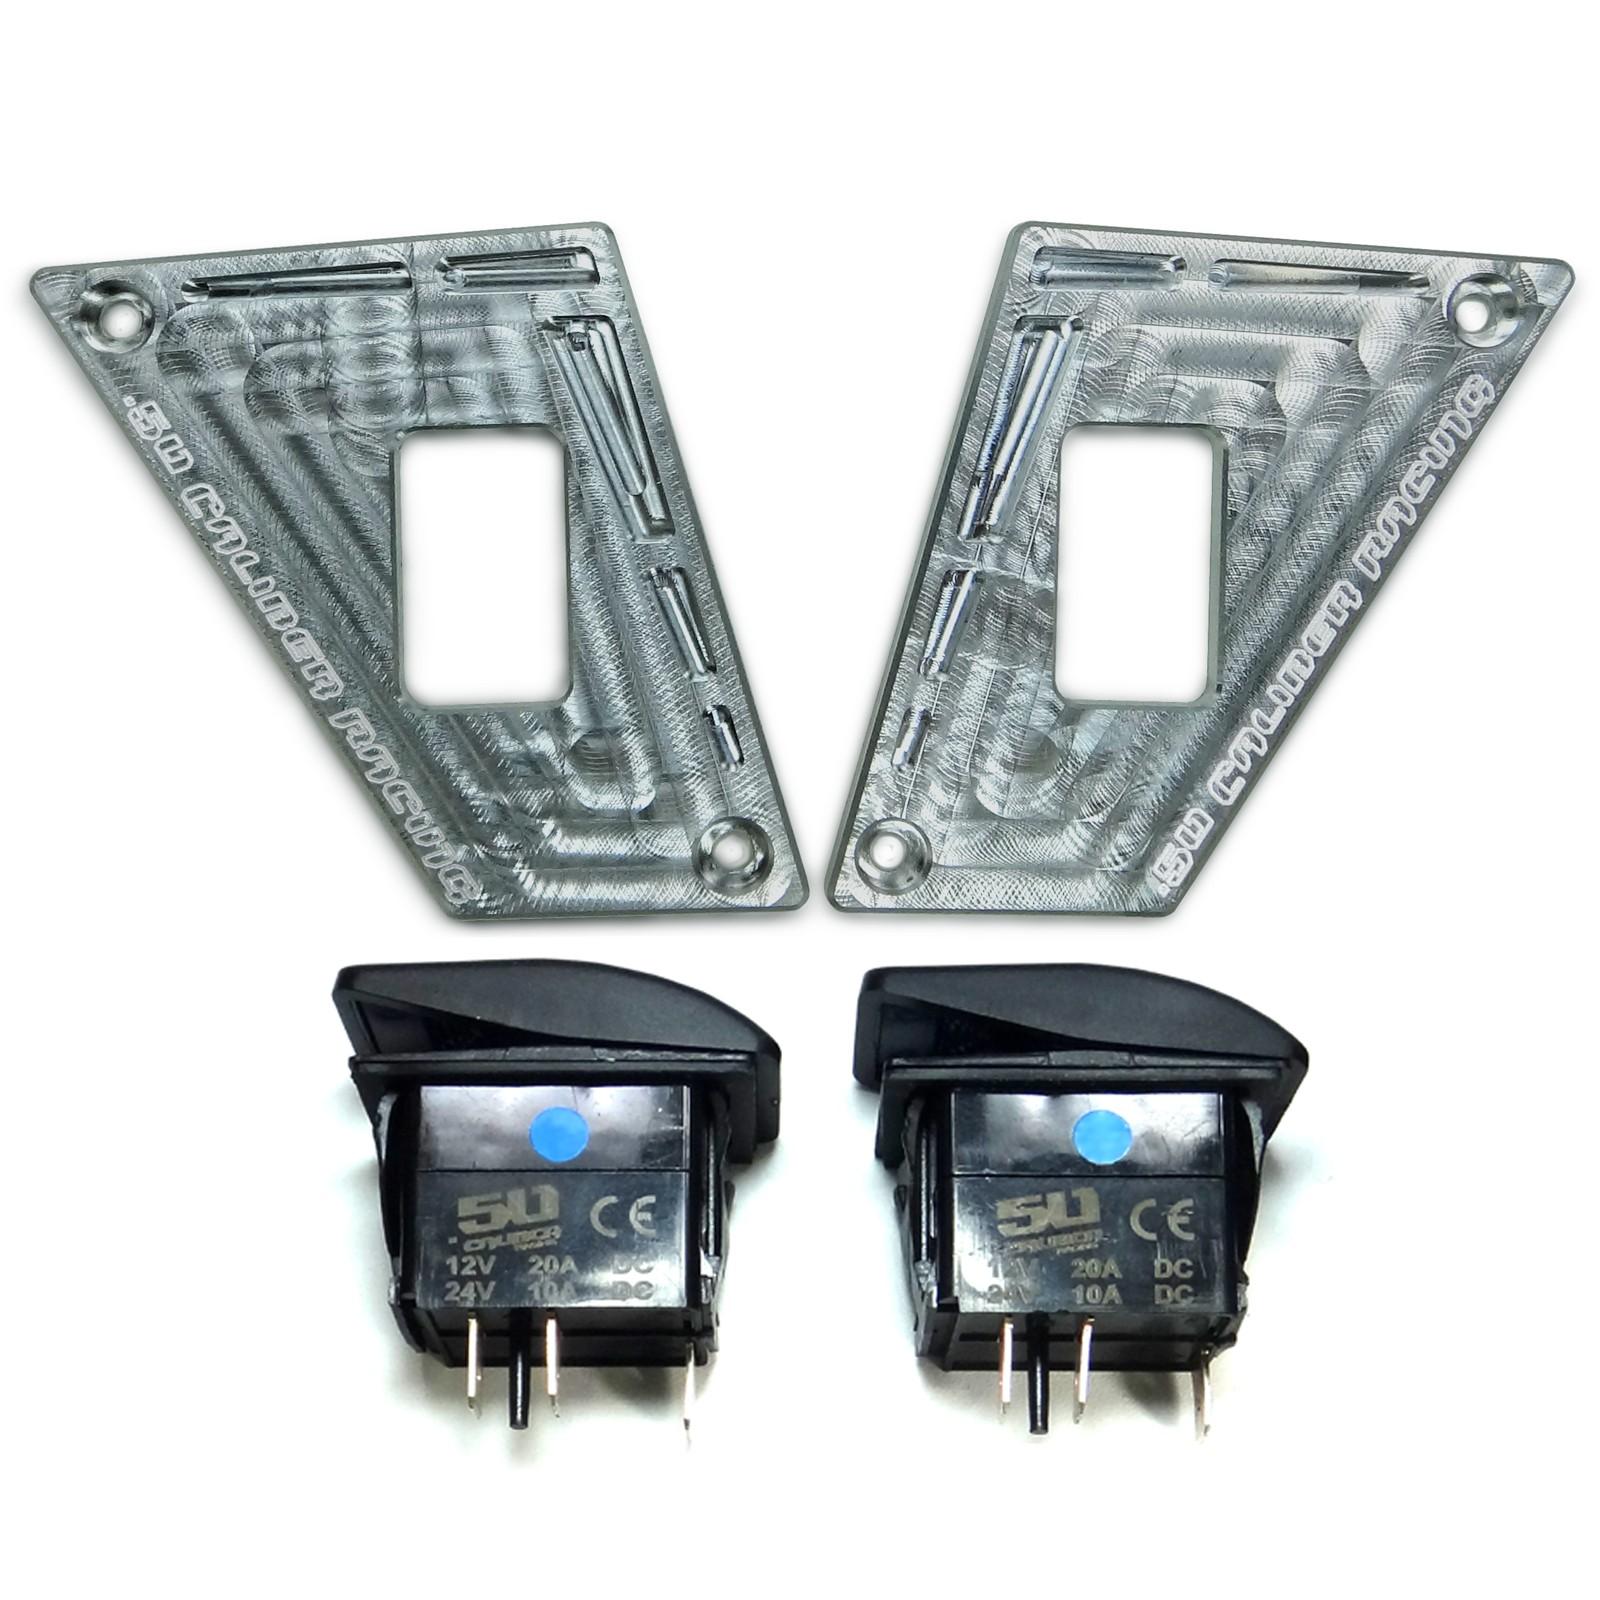 hight resolution of  polaris rzr 170 wiring diagram polari ranger 800 brake switch